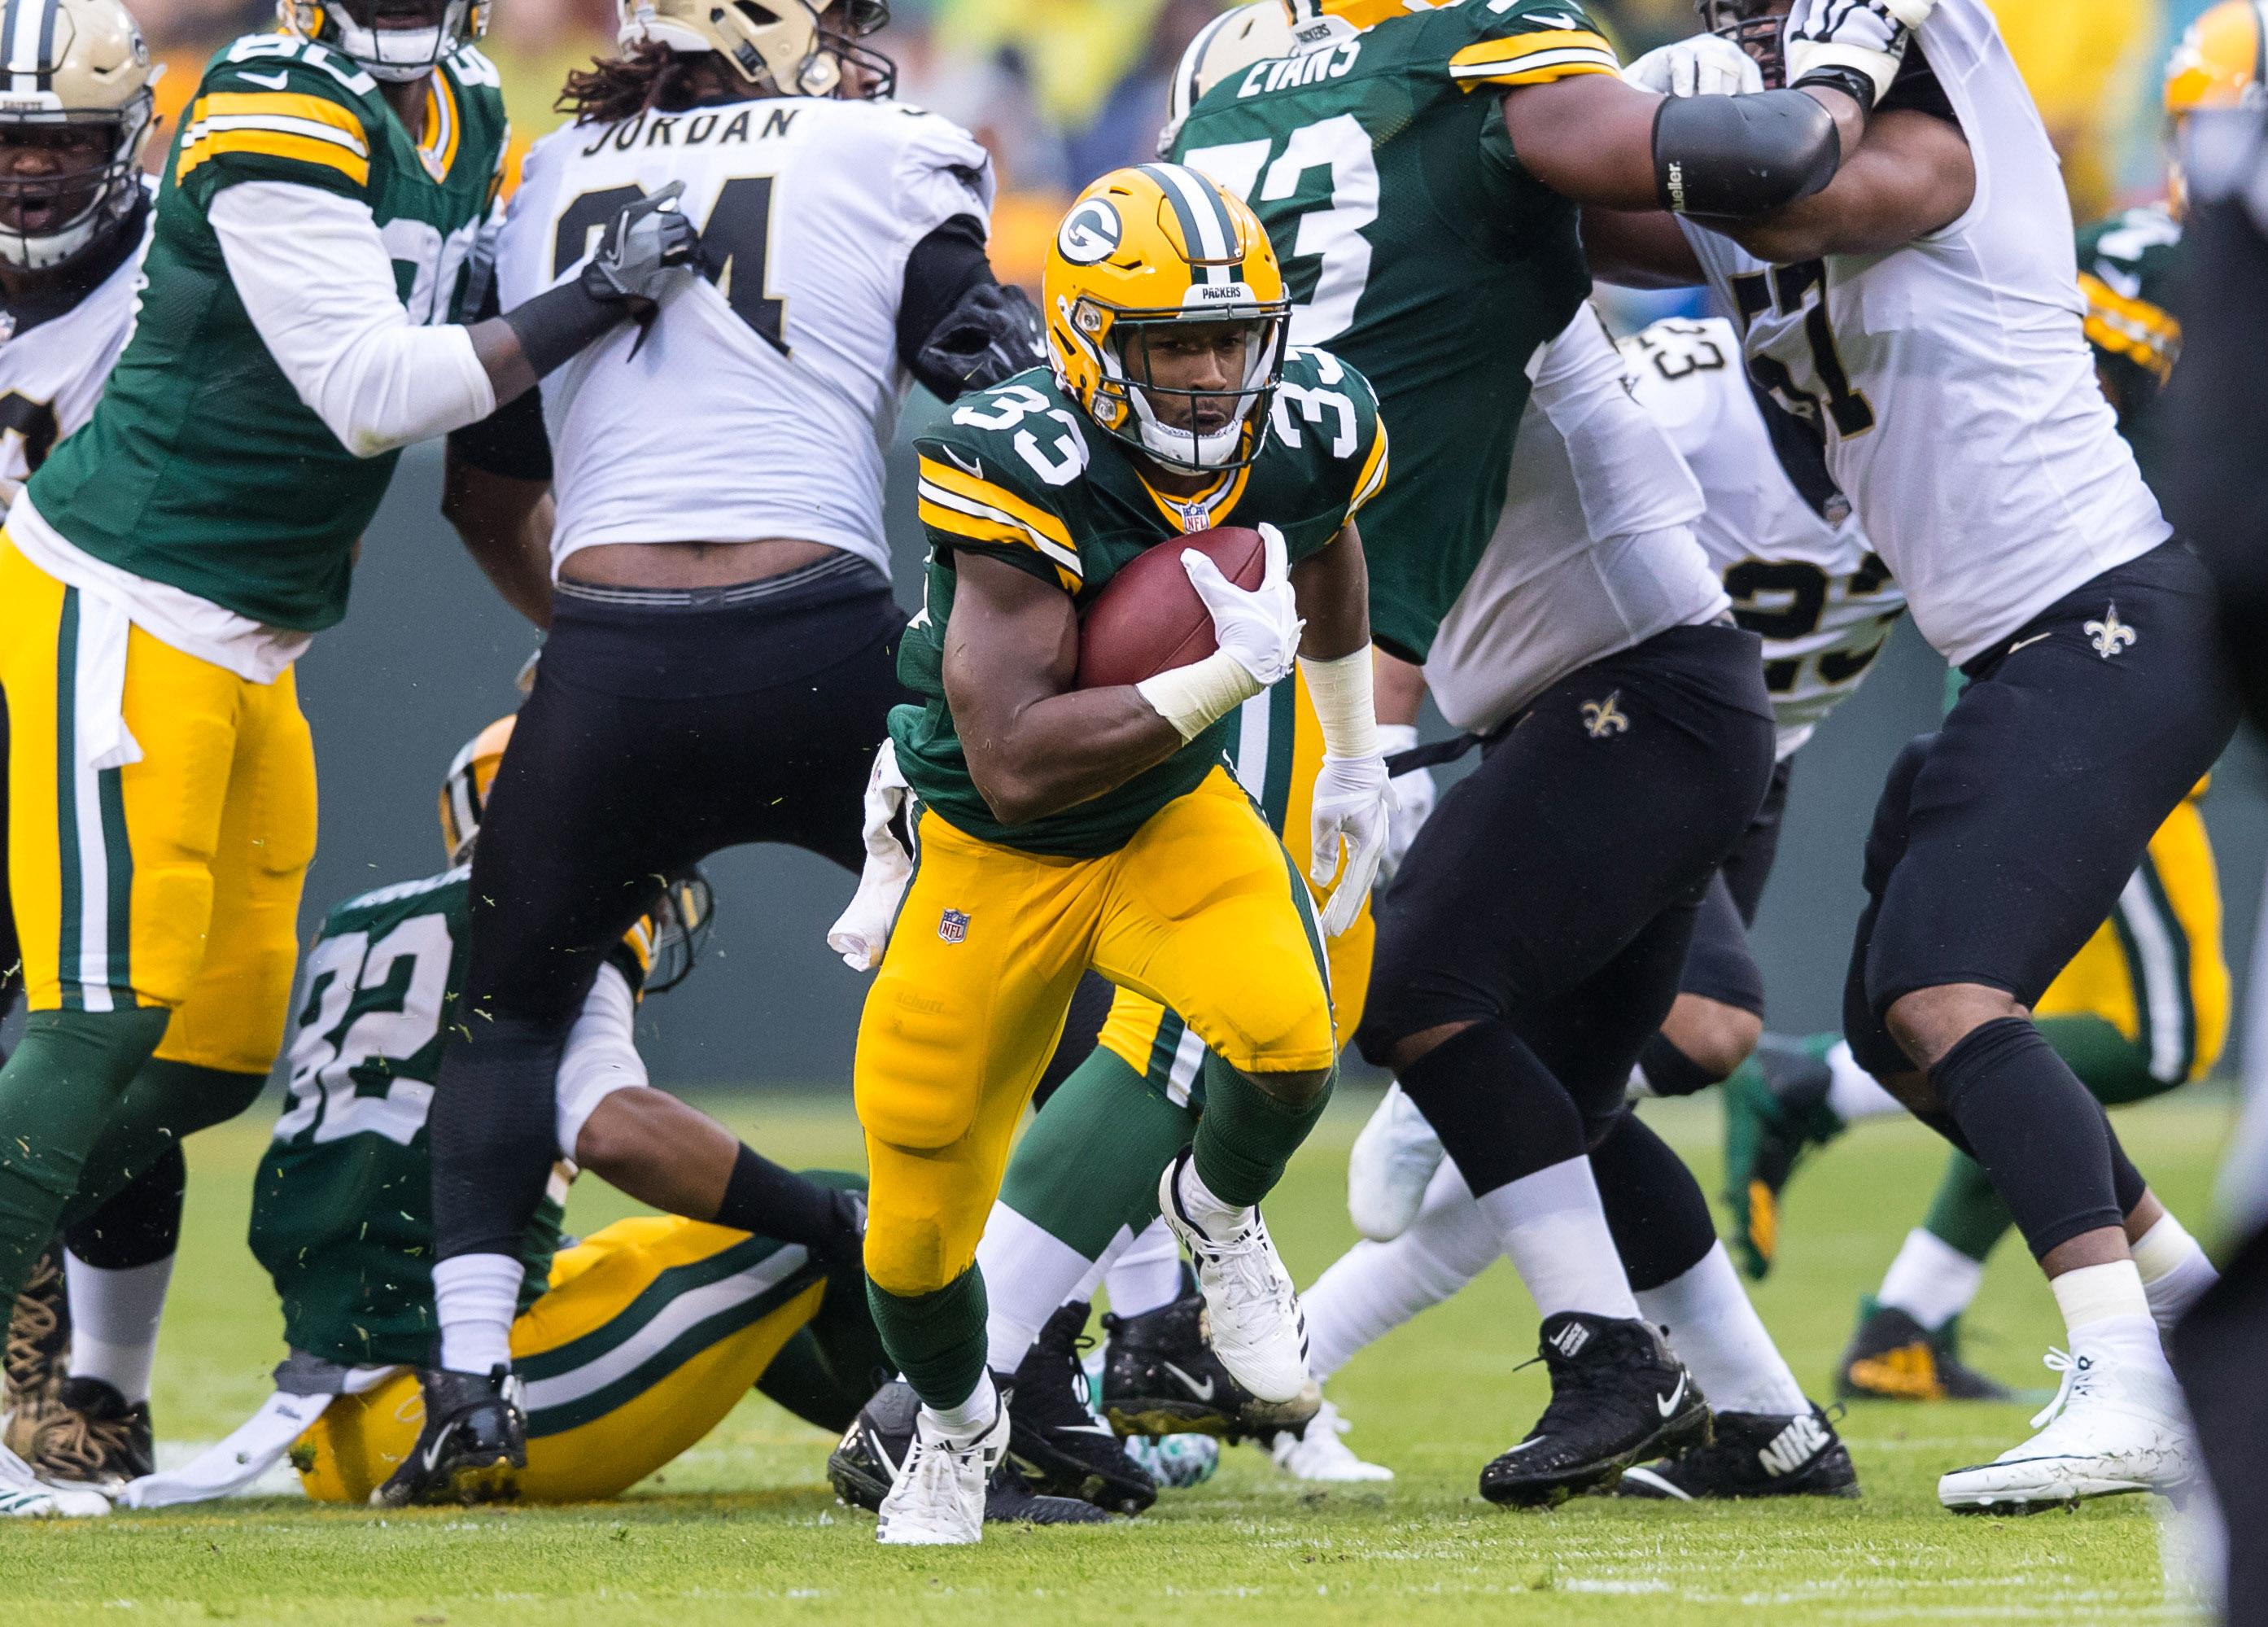 Six Key Factors That Will Determine the Winner of Packers vs Saints